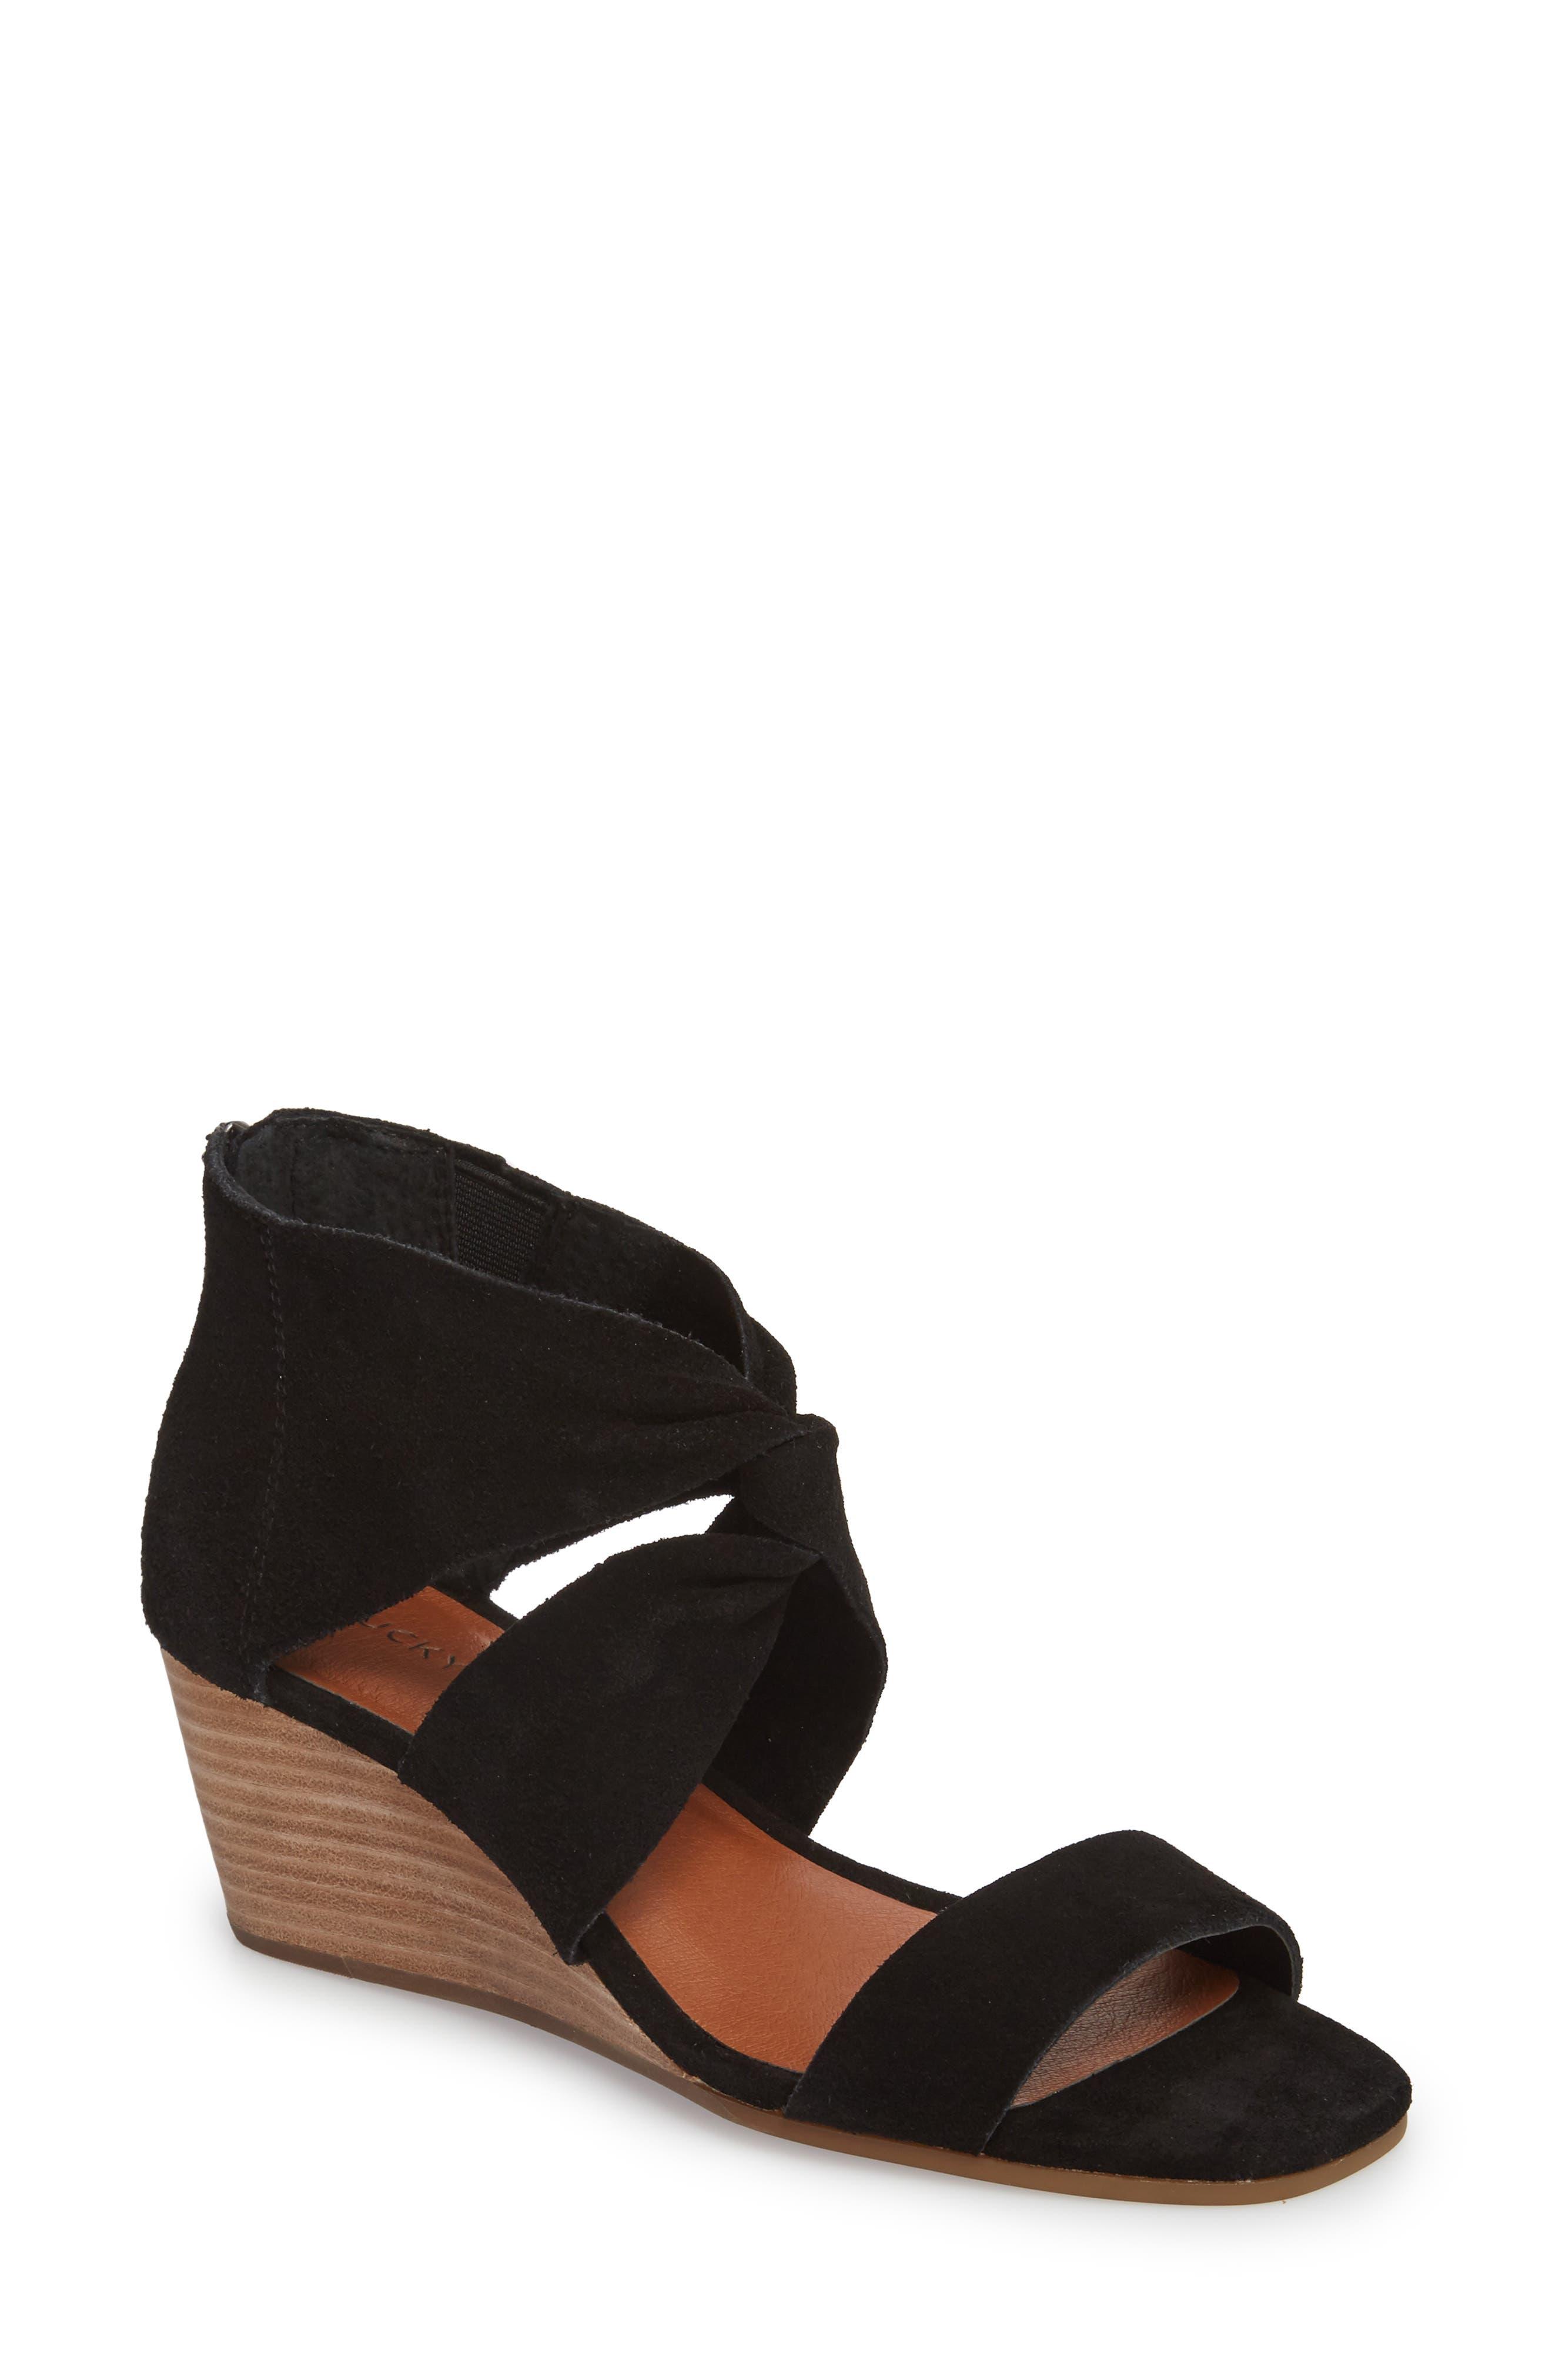 Alternate Image 1 Selected - Lucky Brand Tammanee Wedge Sandal (Women)